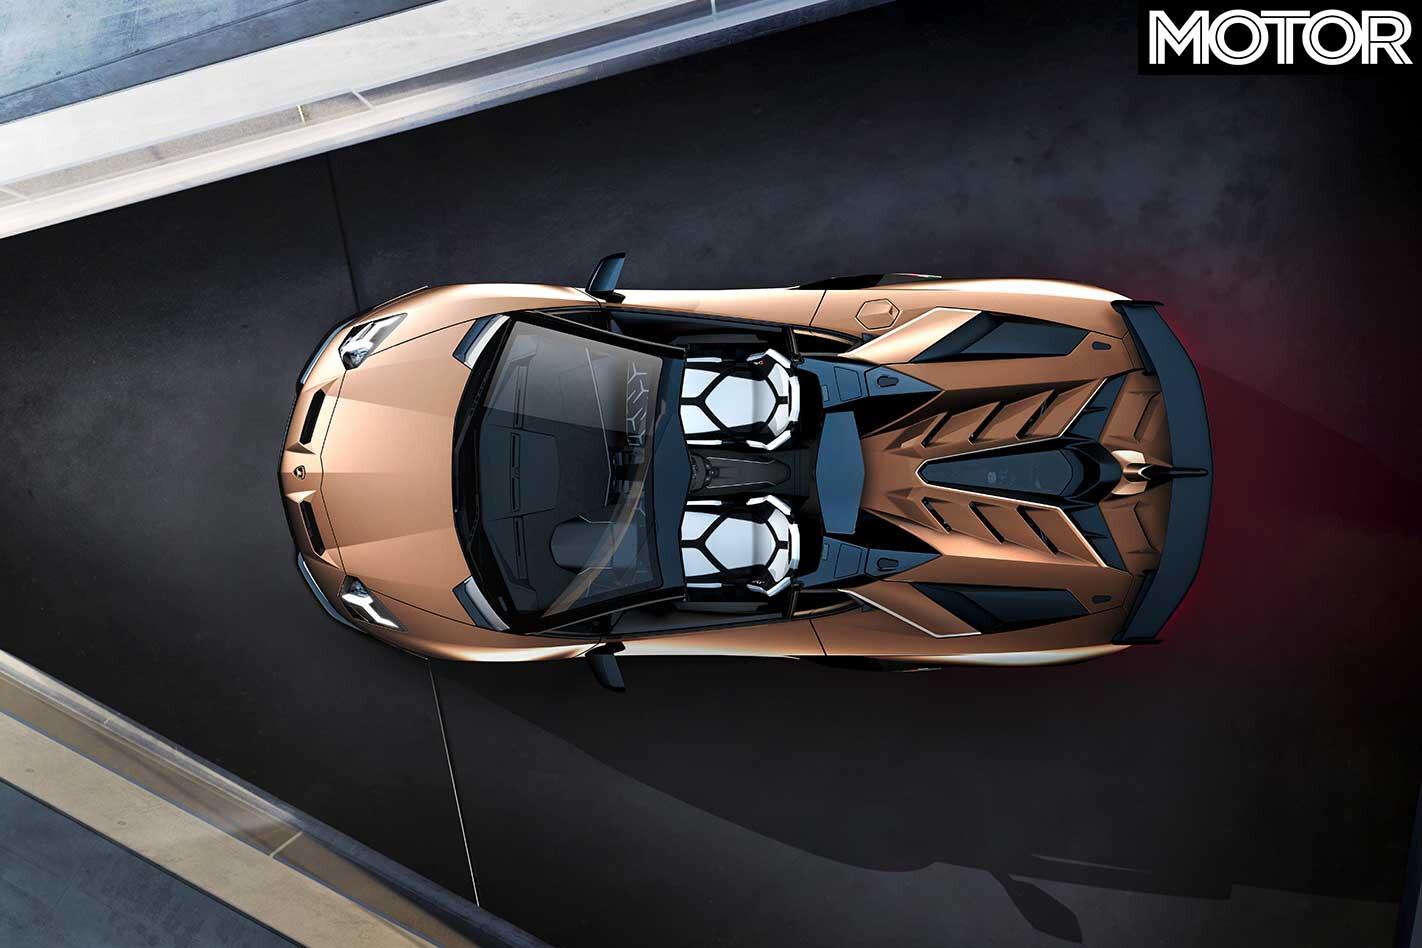 2019 Geneva Motor Show Lamborghini Aventador SVJ Roadster Top 281 29 Jpg